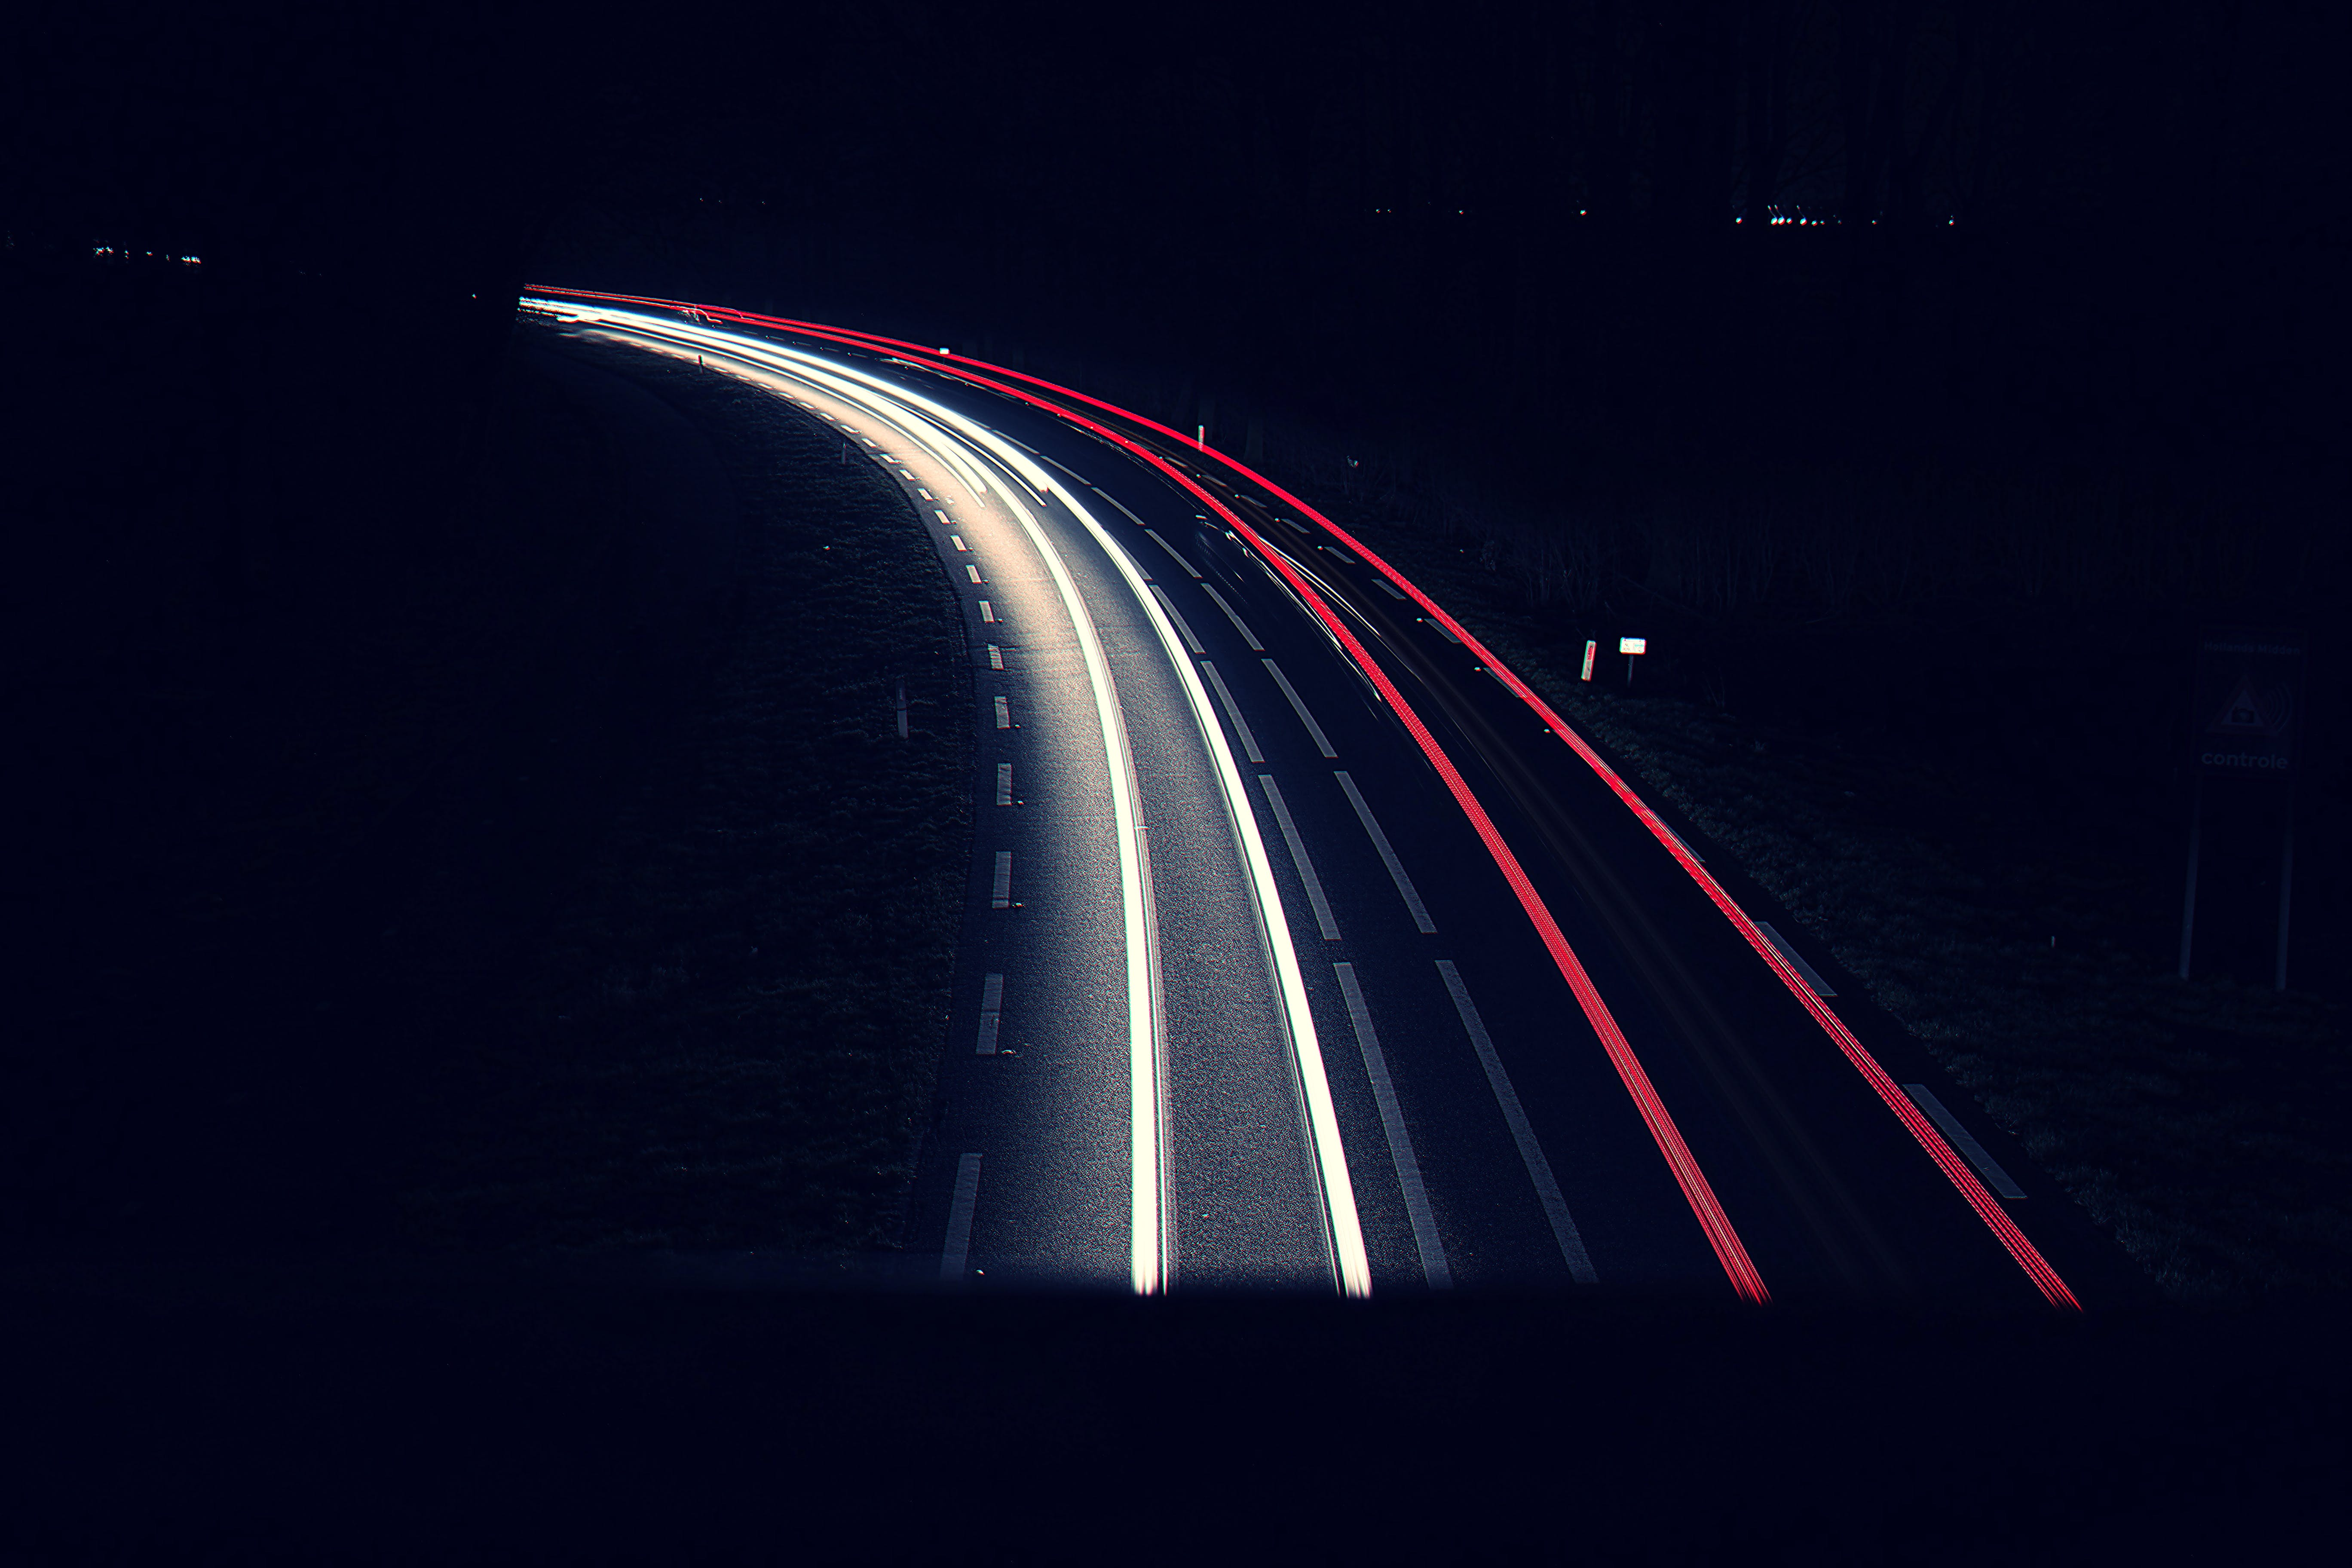 beleuchtung, dunkel, langzeitbelichtung